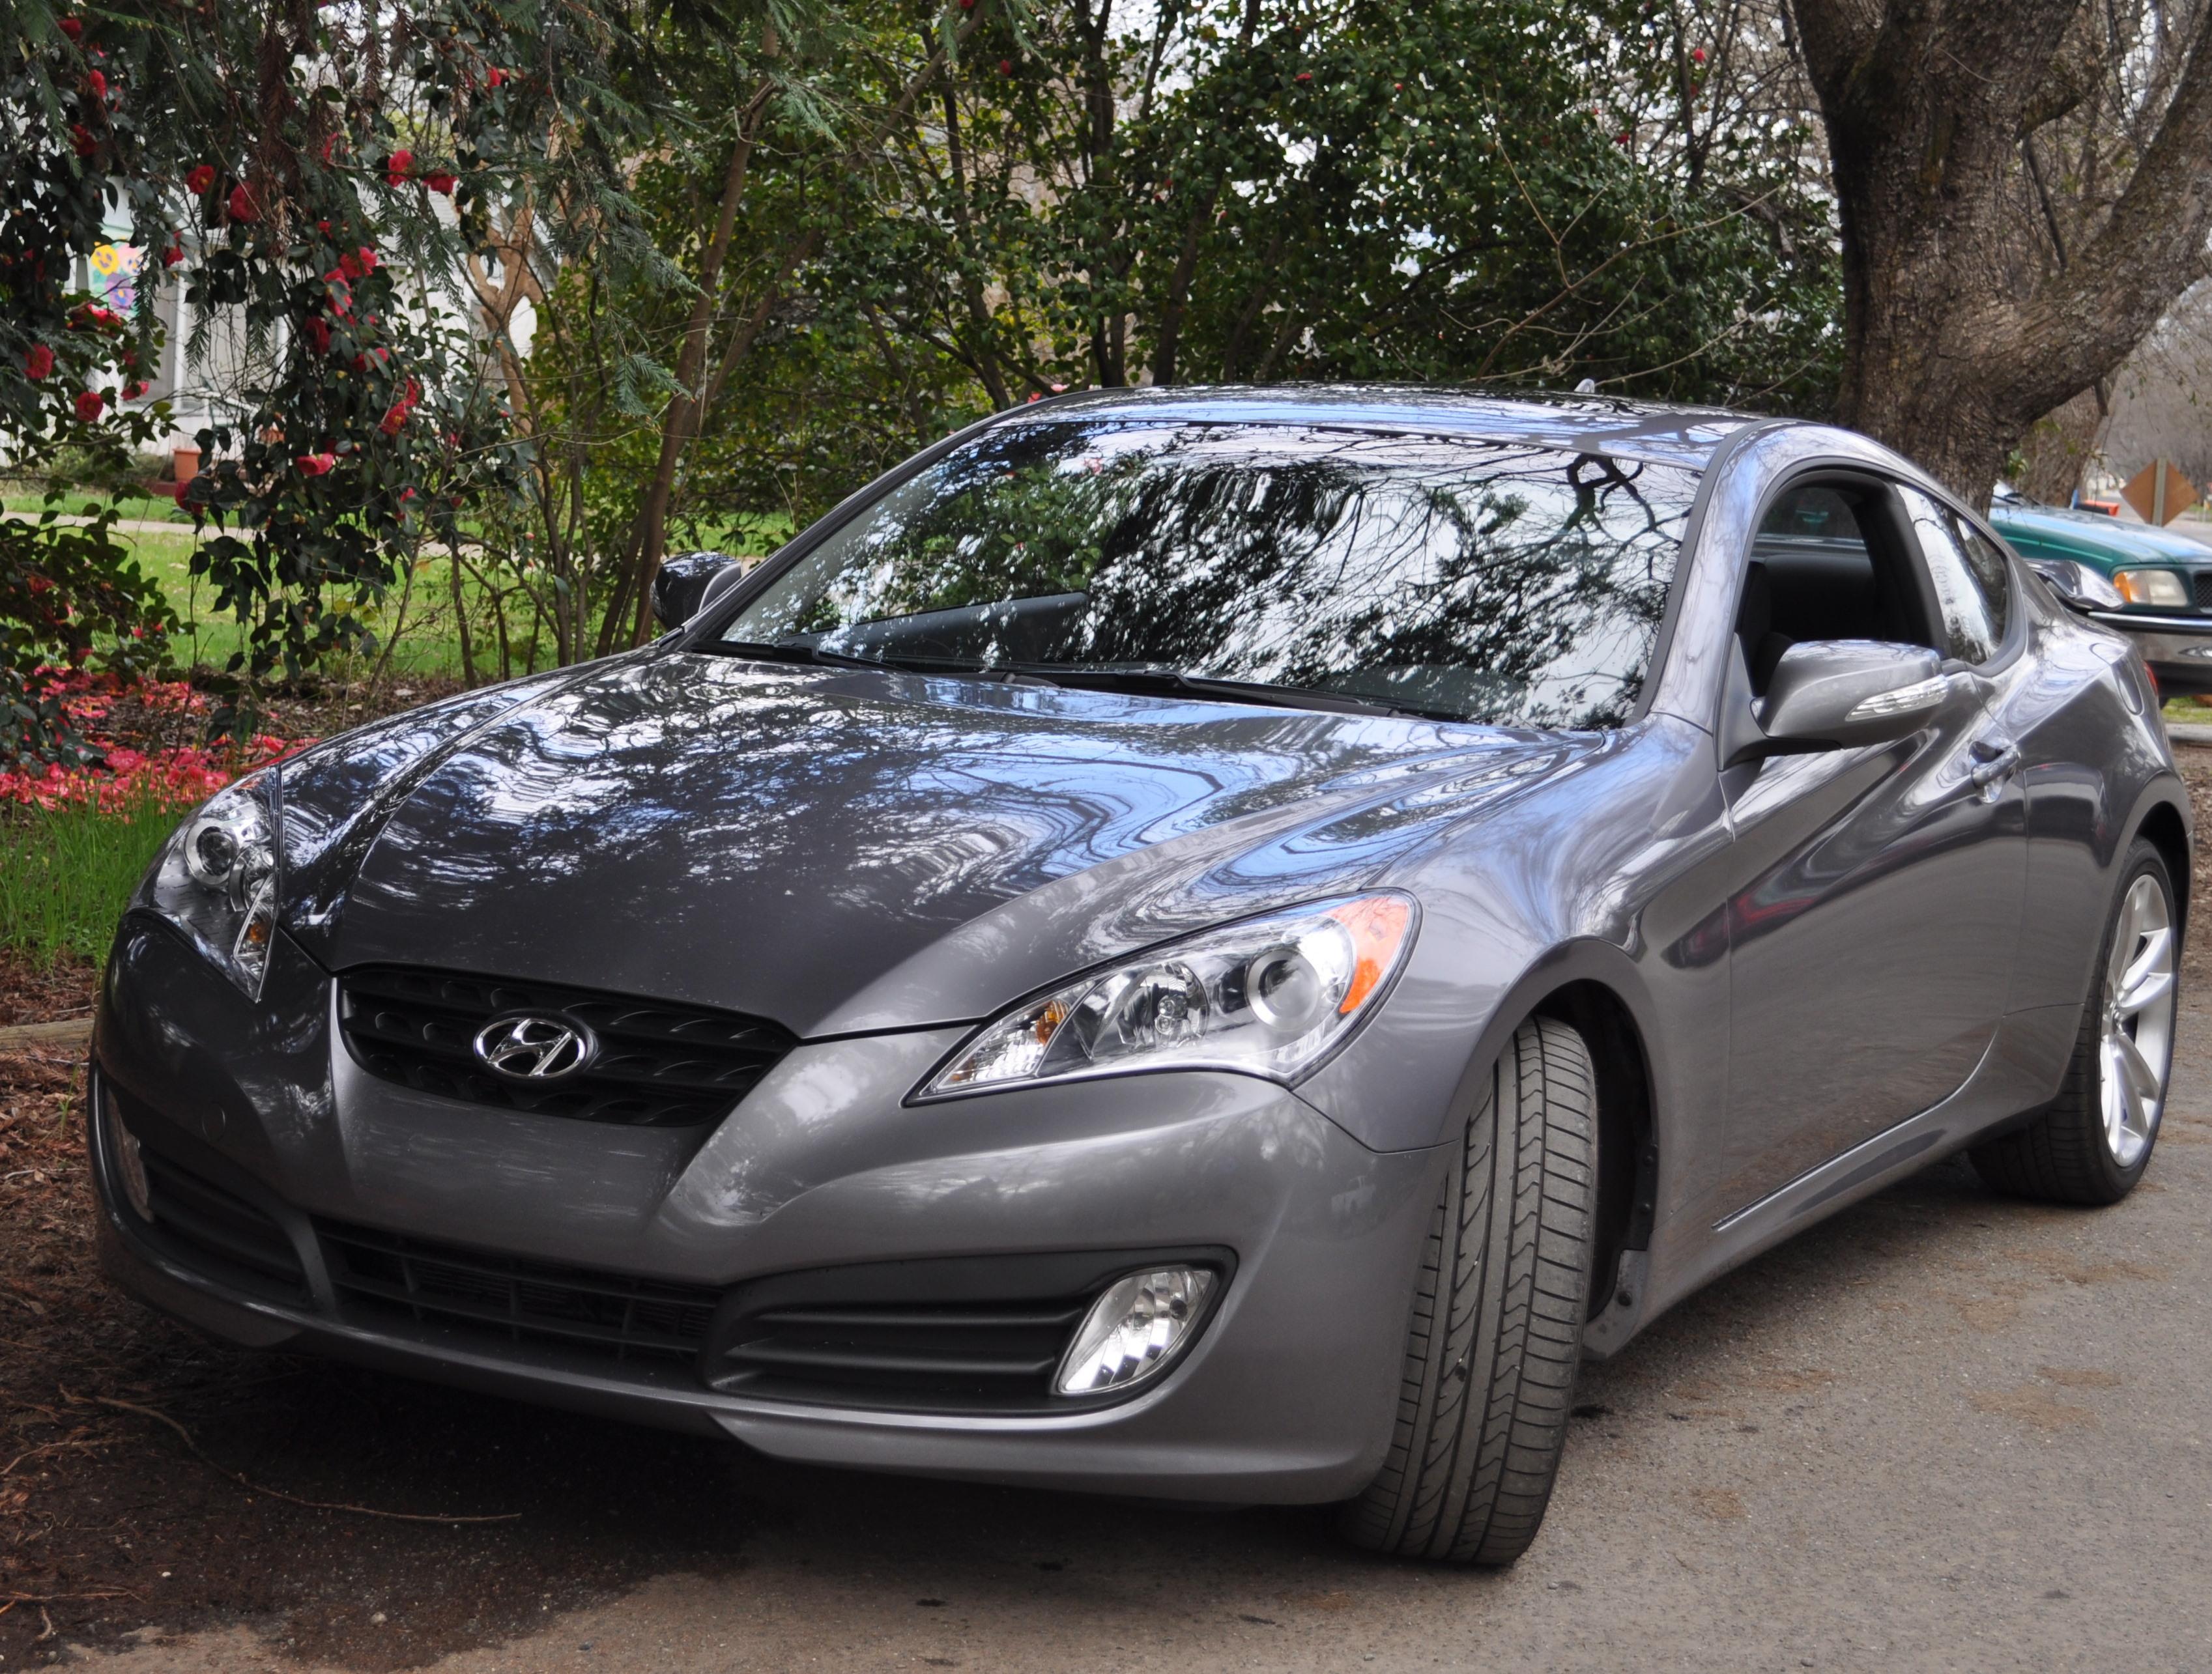 2010 hyundai genesis coupe 3 8 track review autosavant autosavant - 2010 Hyundai Genesis Coup Review